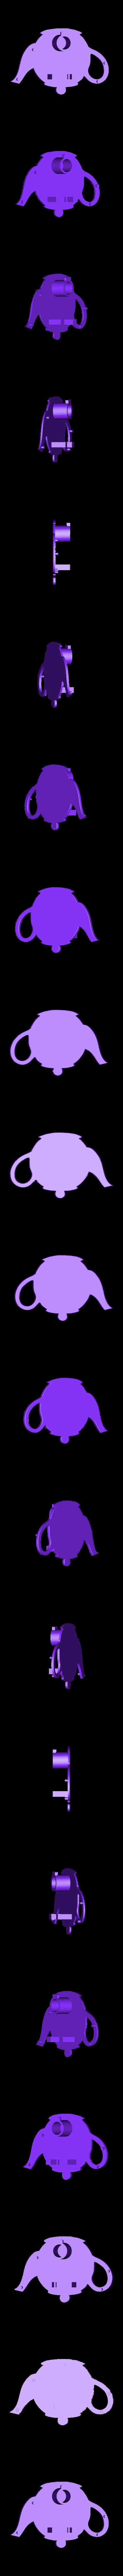 Tea_Chest_Teapot_Decor.STL Download free STL file Countertop Tea Chest • Model to 3D print, Festus440